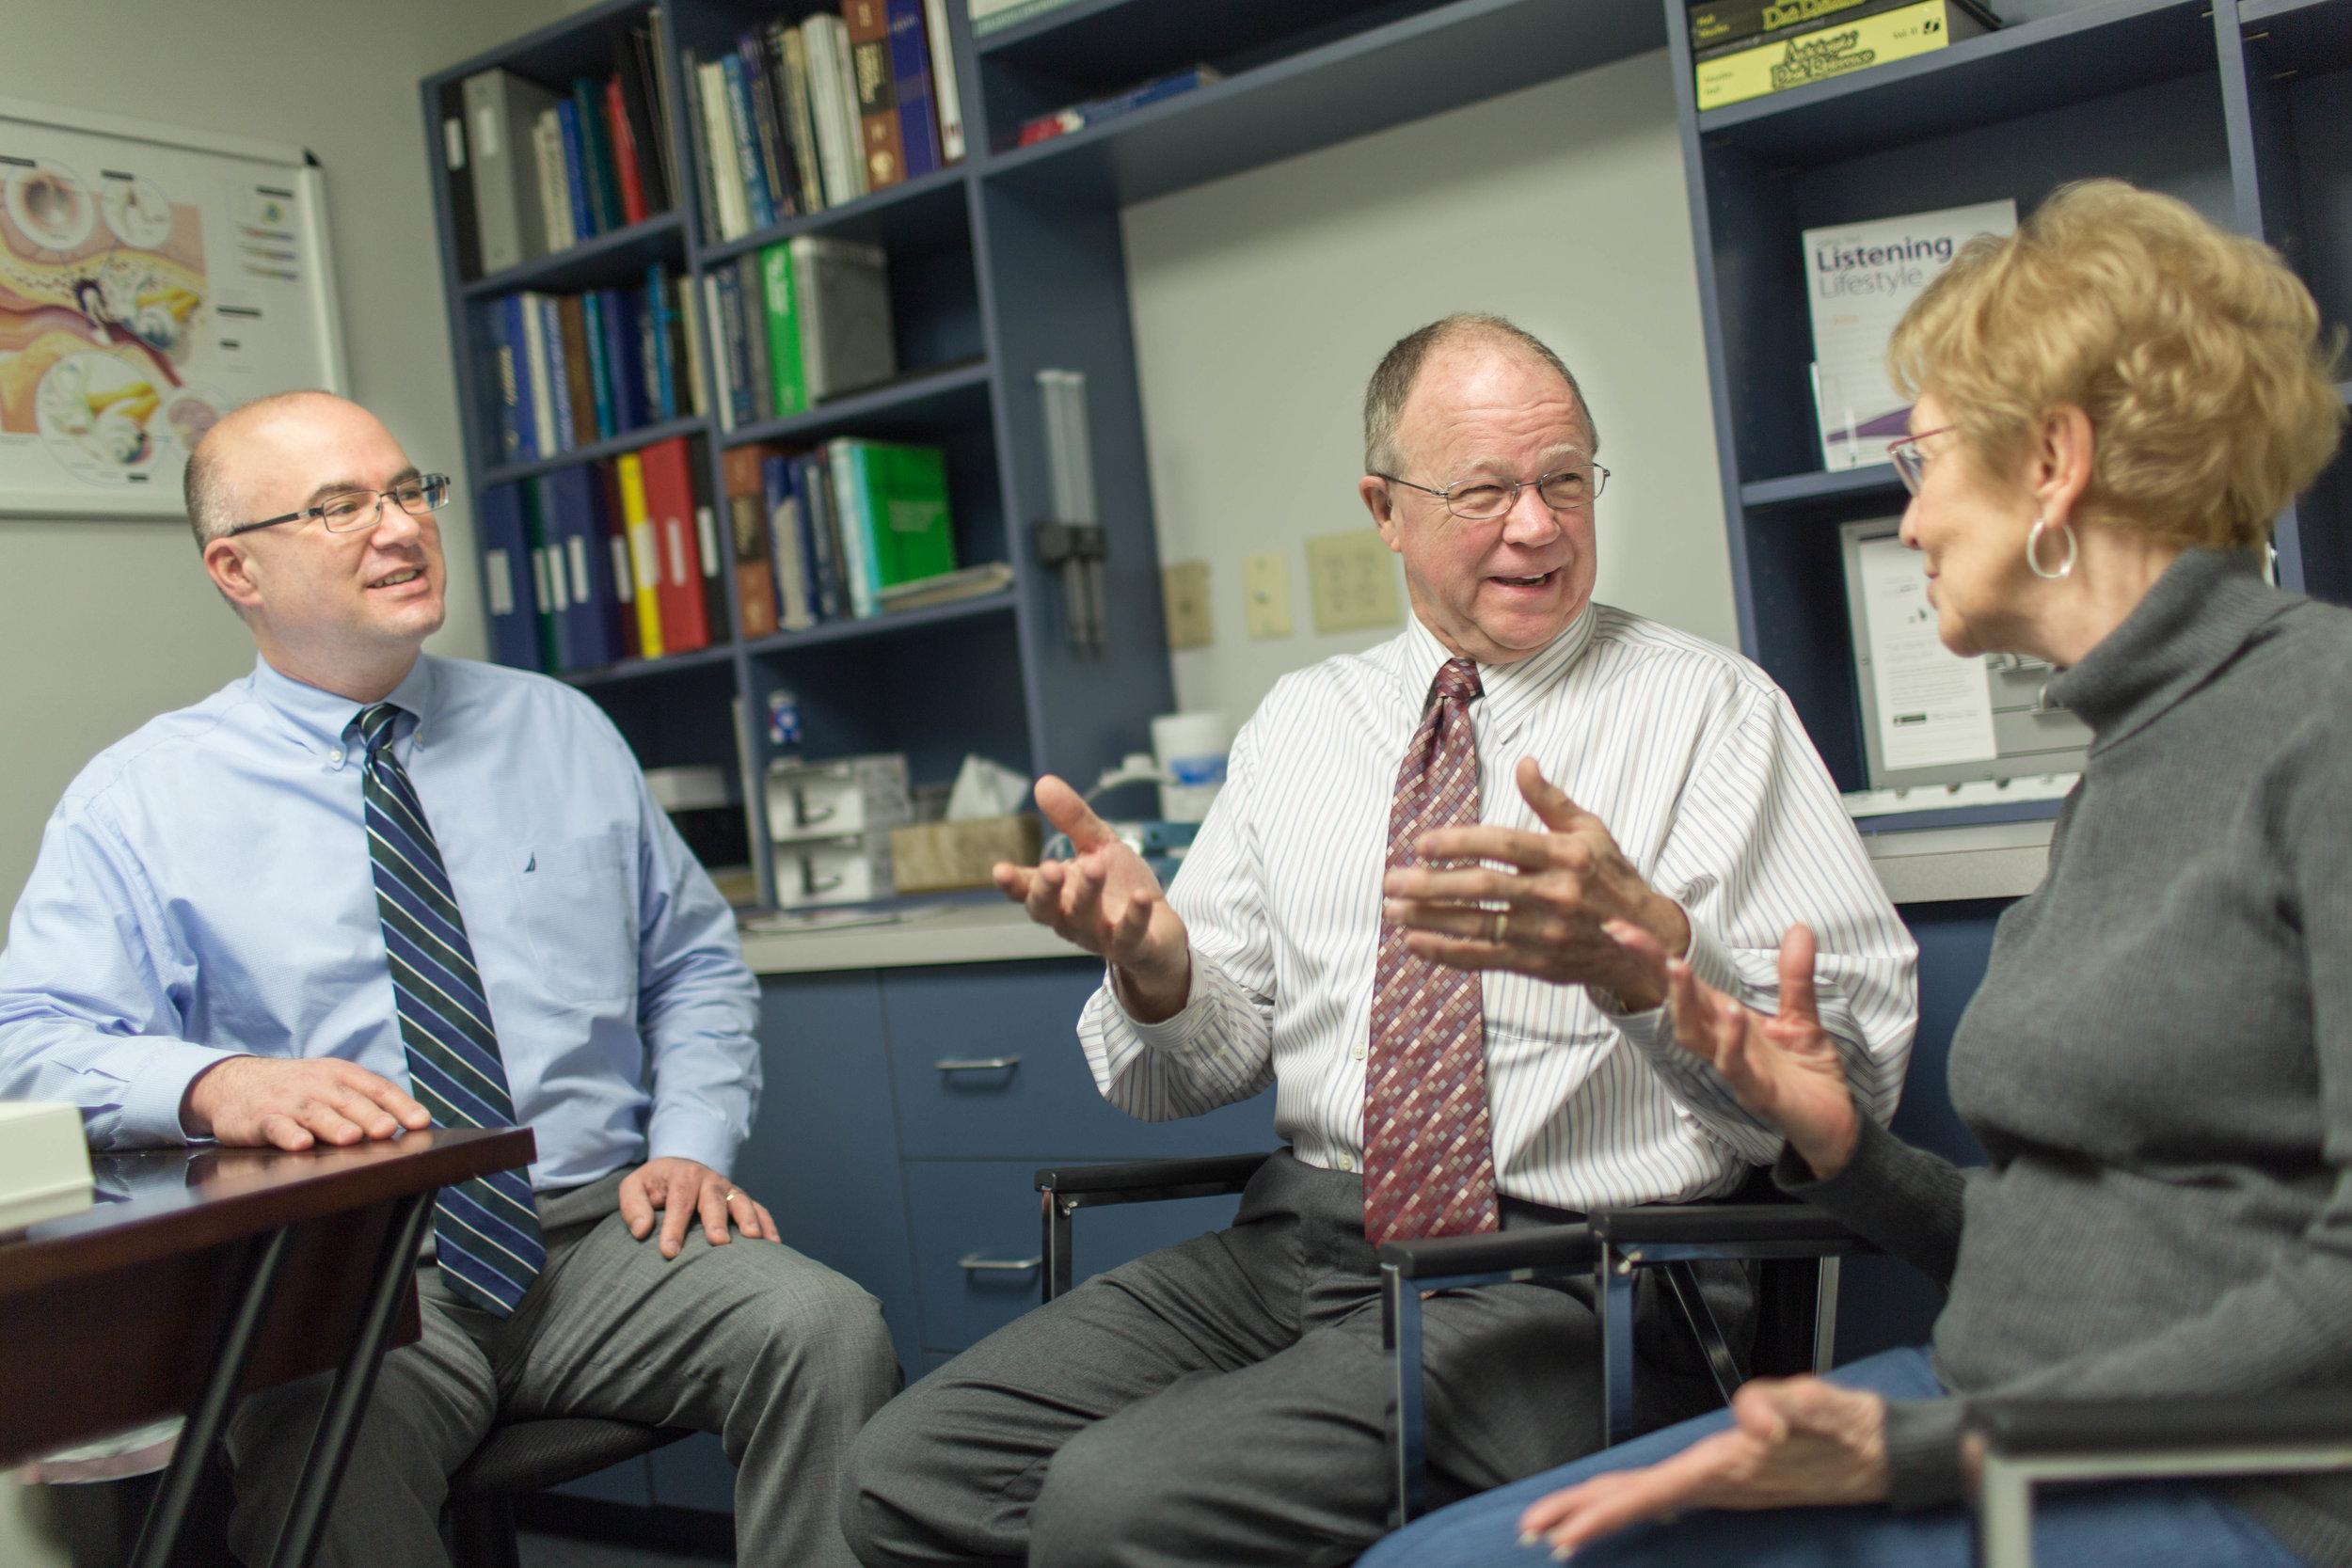 Dr. Douglas Cameron, Hearing Health Associates Roanoke